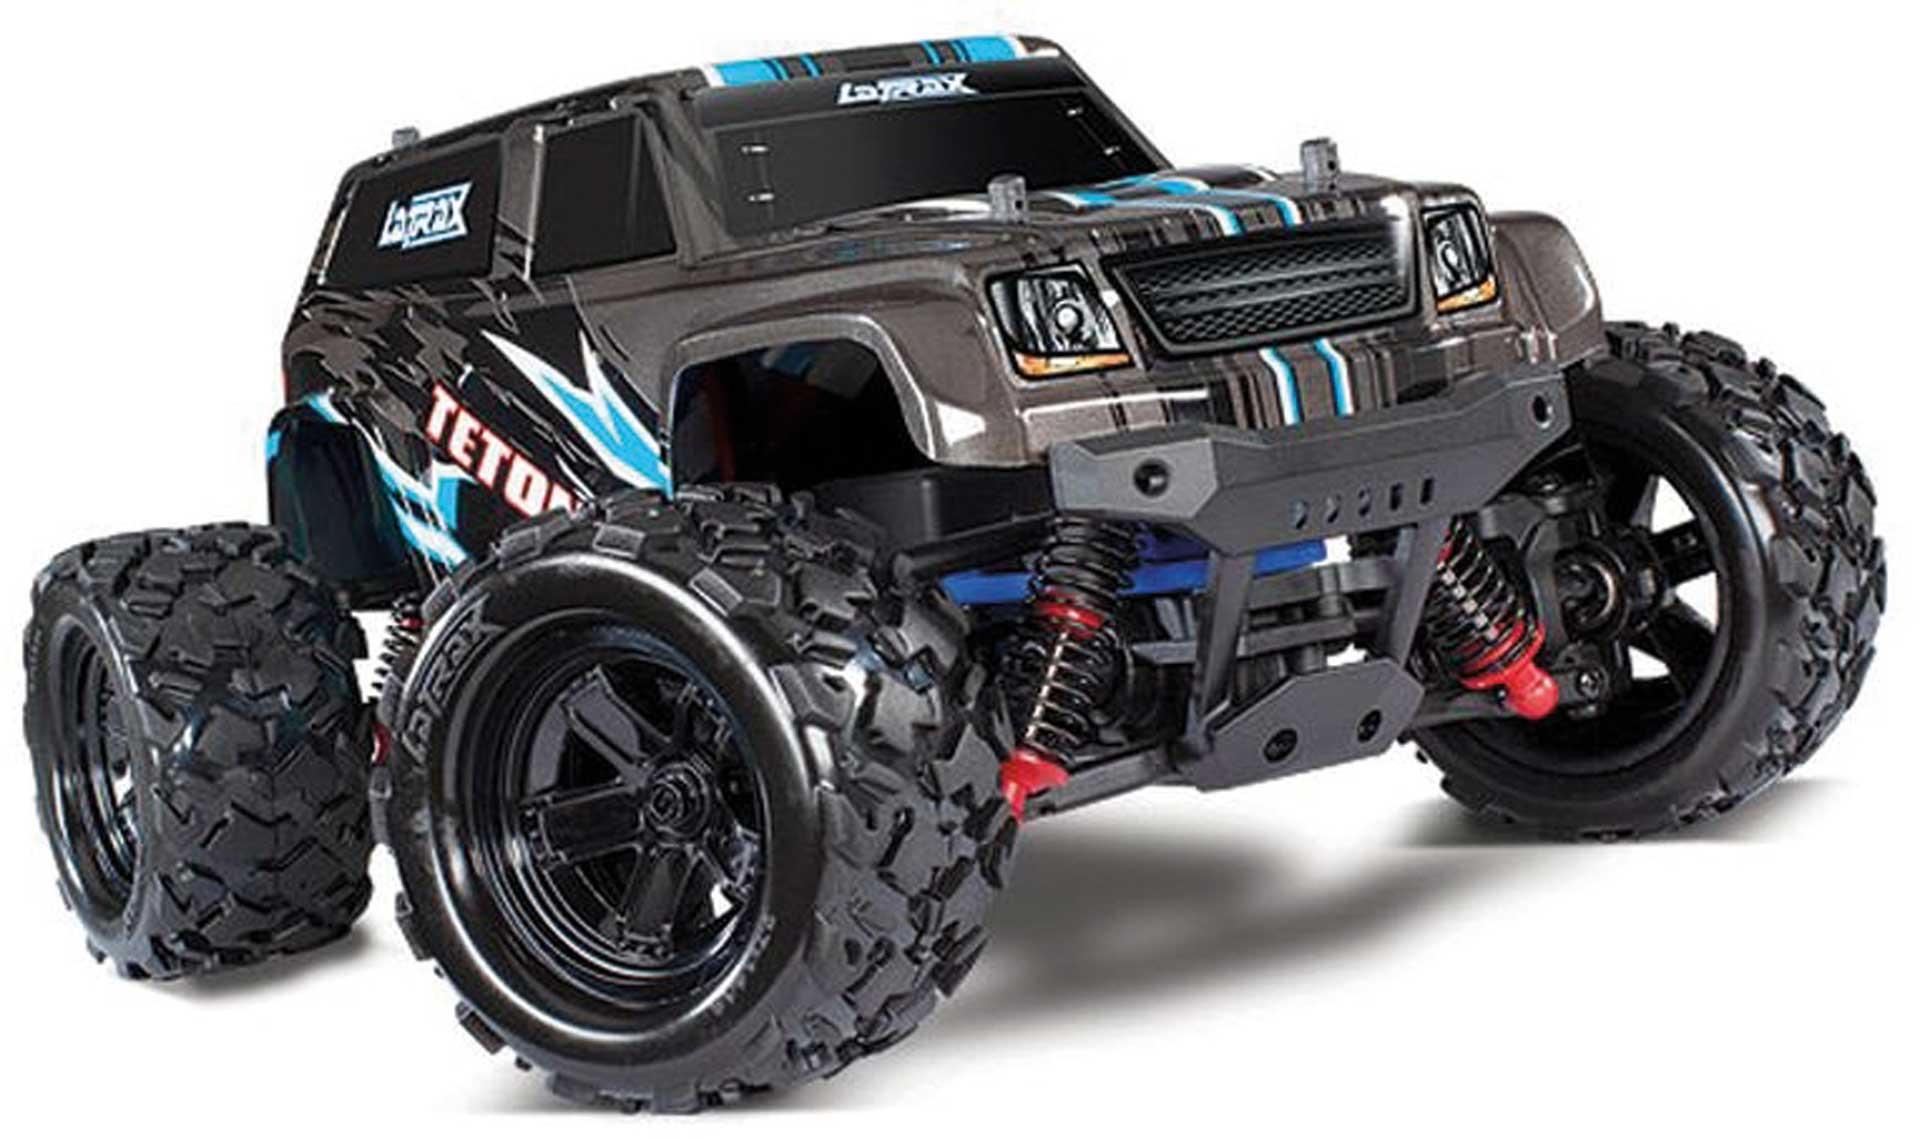 Traxxas TETON 4X4 SCHWARZ RTR +12V-LADER+AKKU 1/18 4WD MONSTER TRUCK BRUSHED